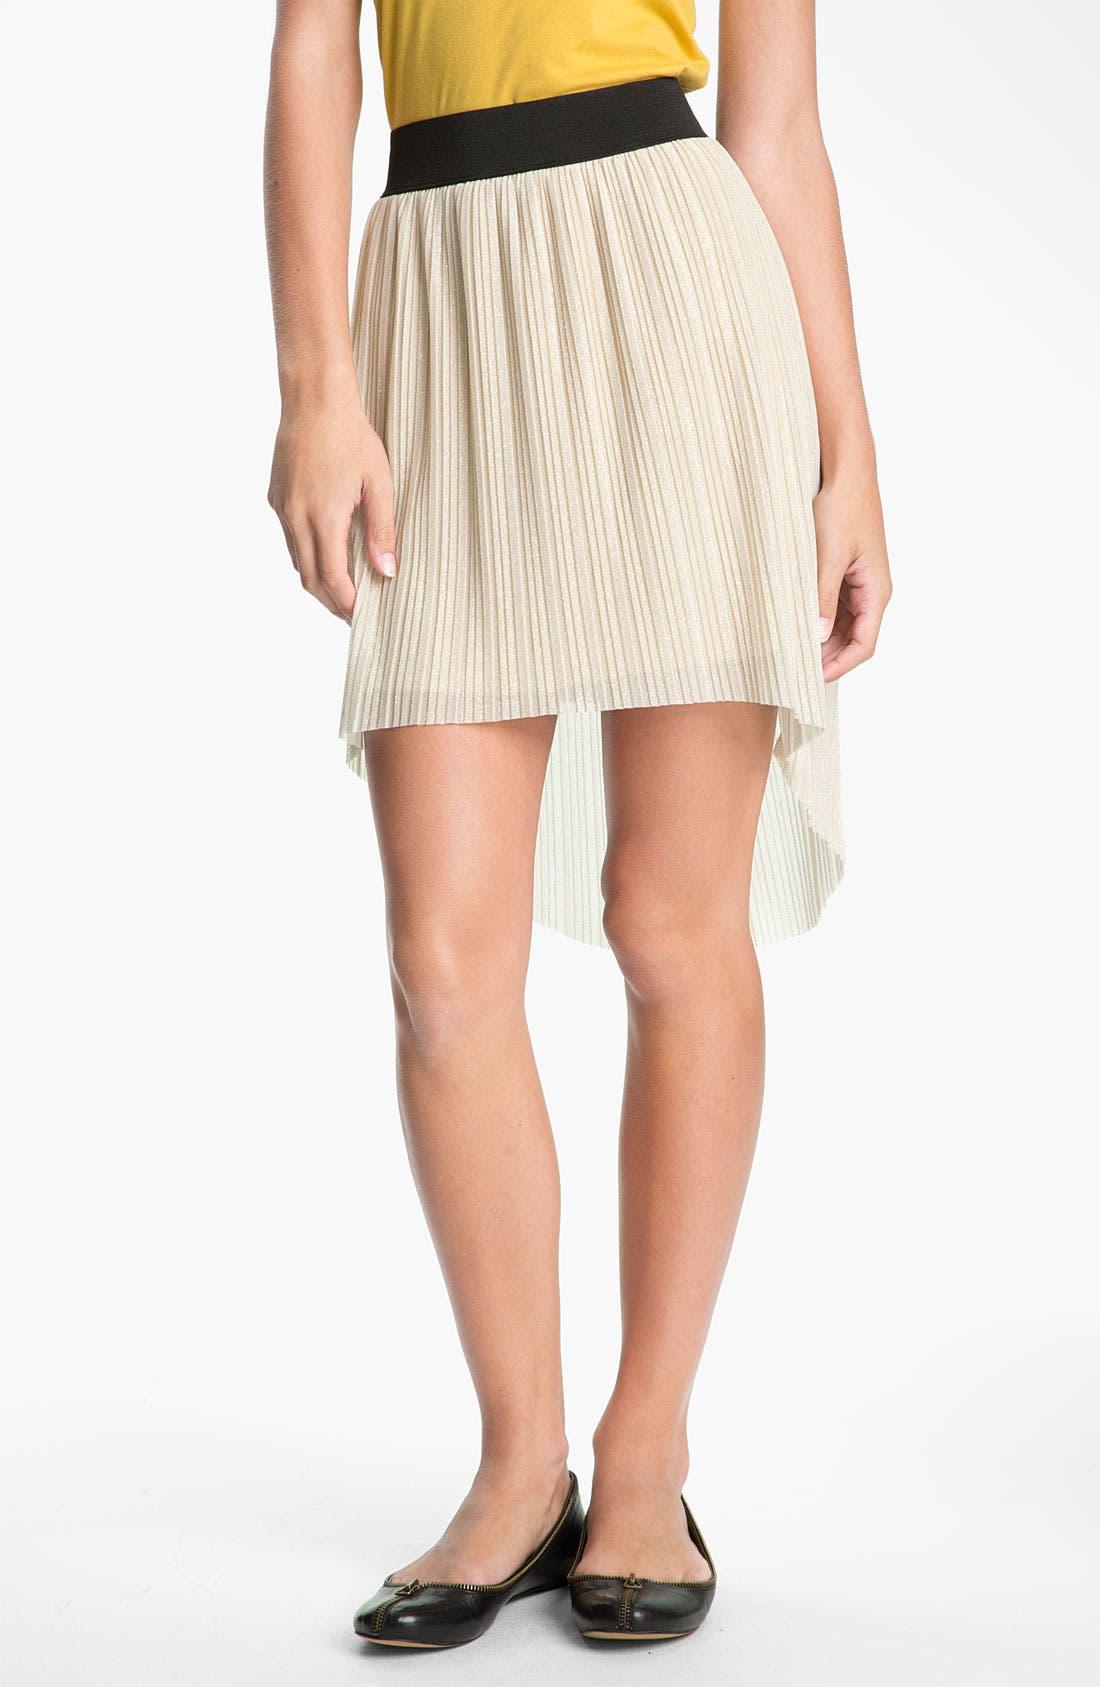 Alternate Image 1 Selected - Mimi Chica Metallic Pleat High/Low Skirt